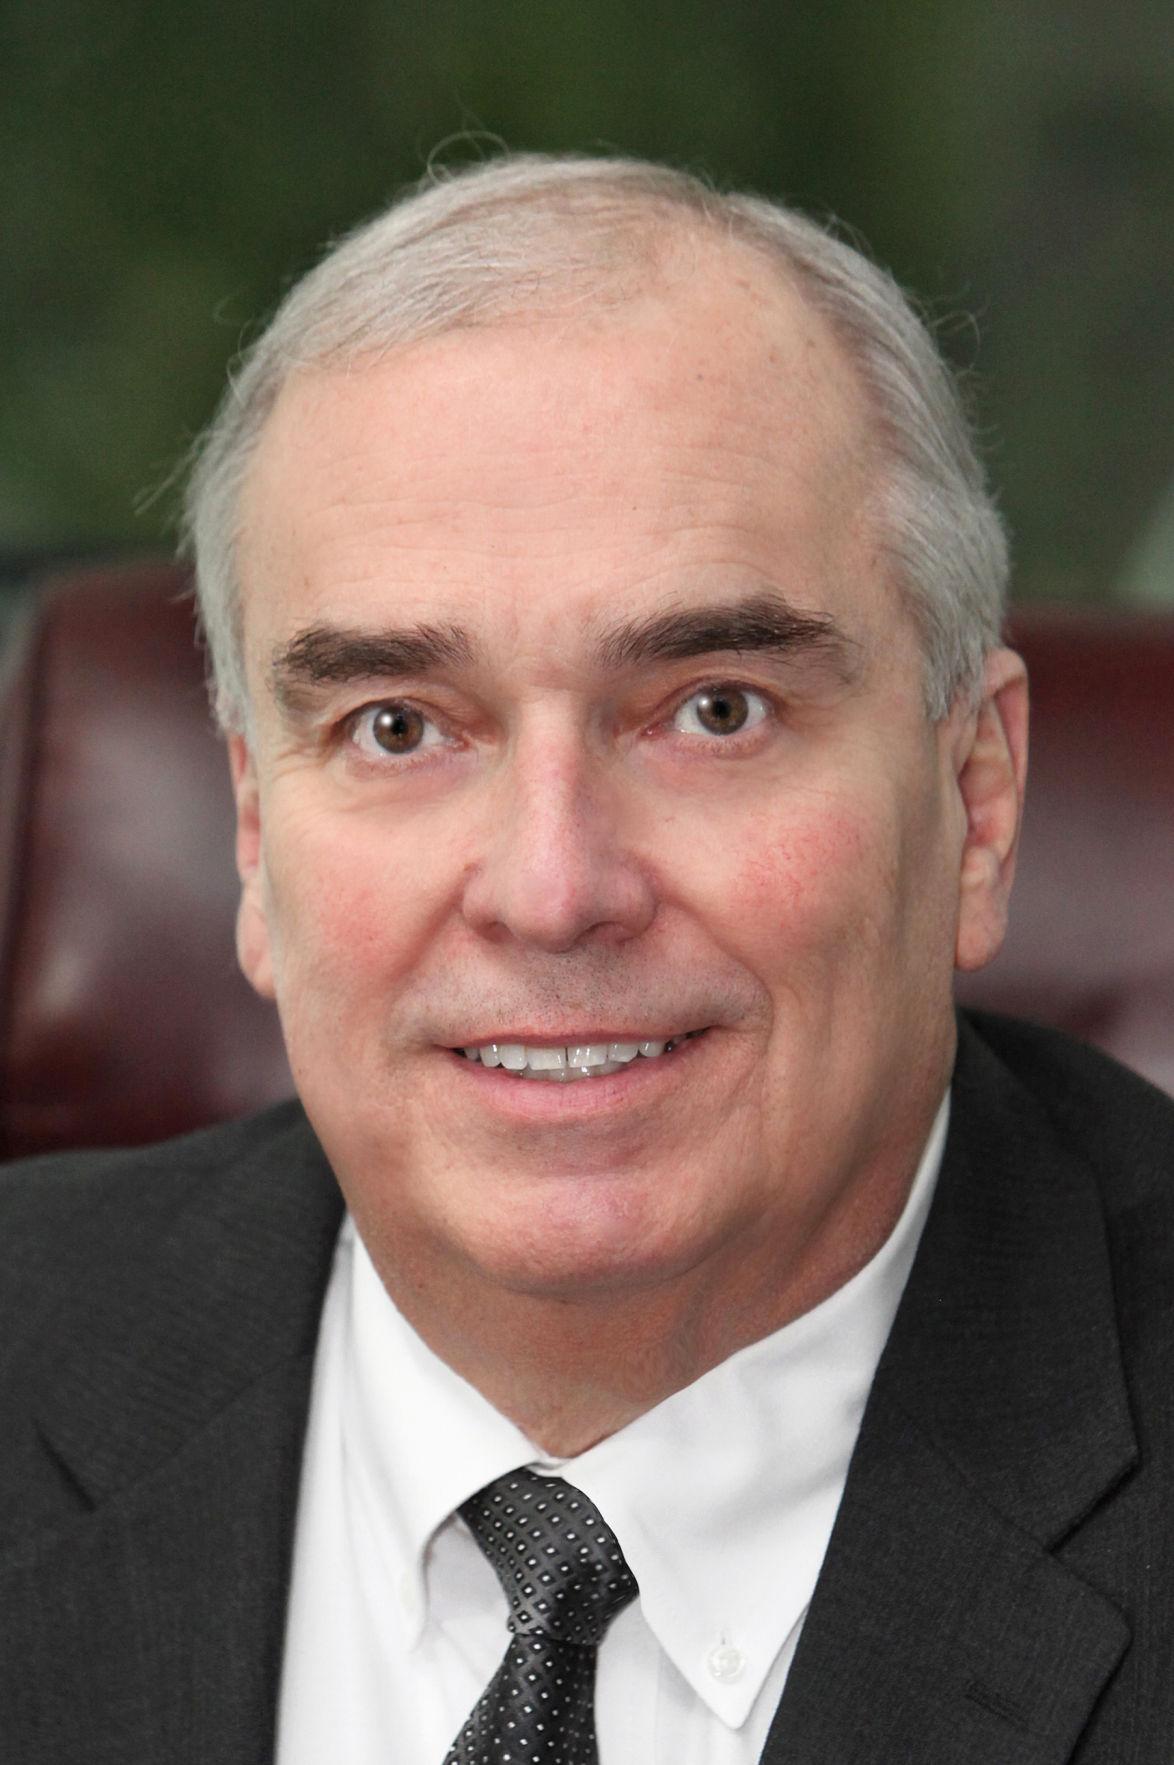 Steve Stumpf Chairman Of Durr Heavy Construction Dies